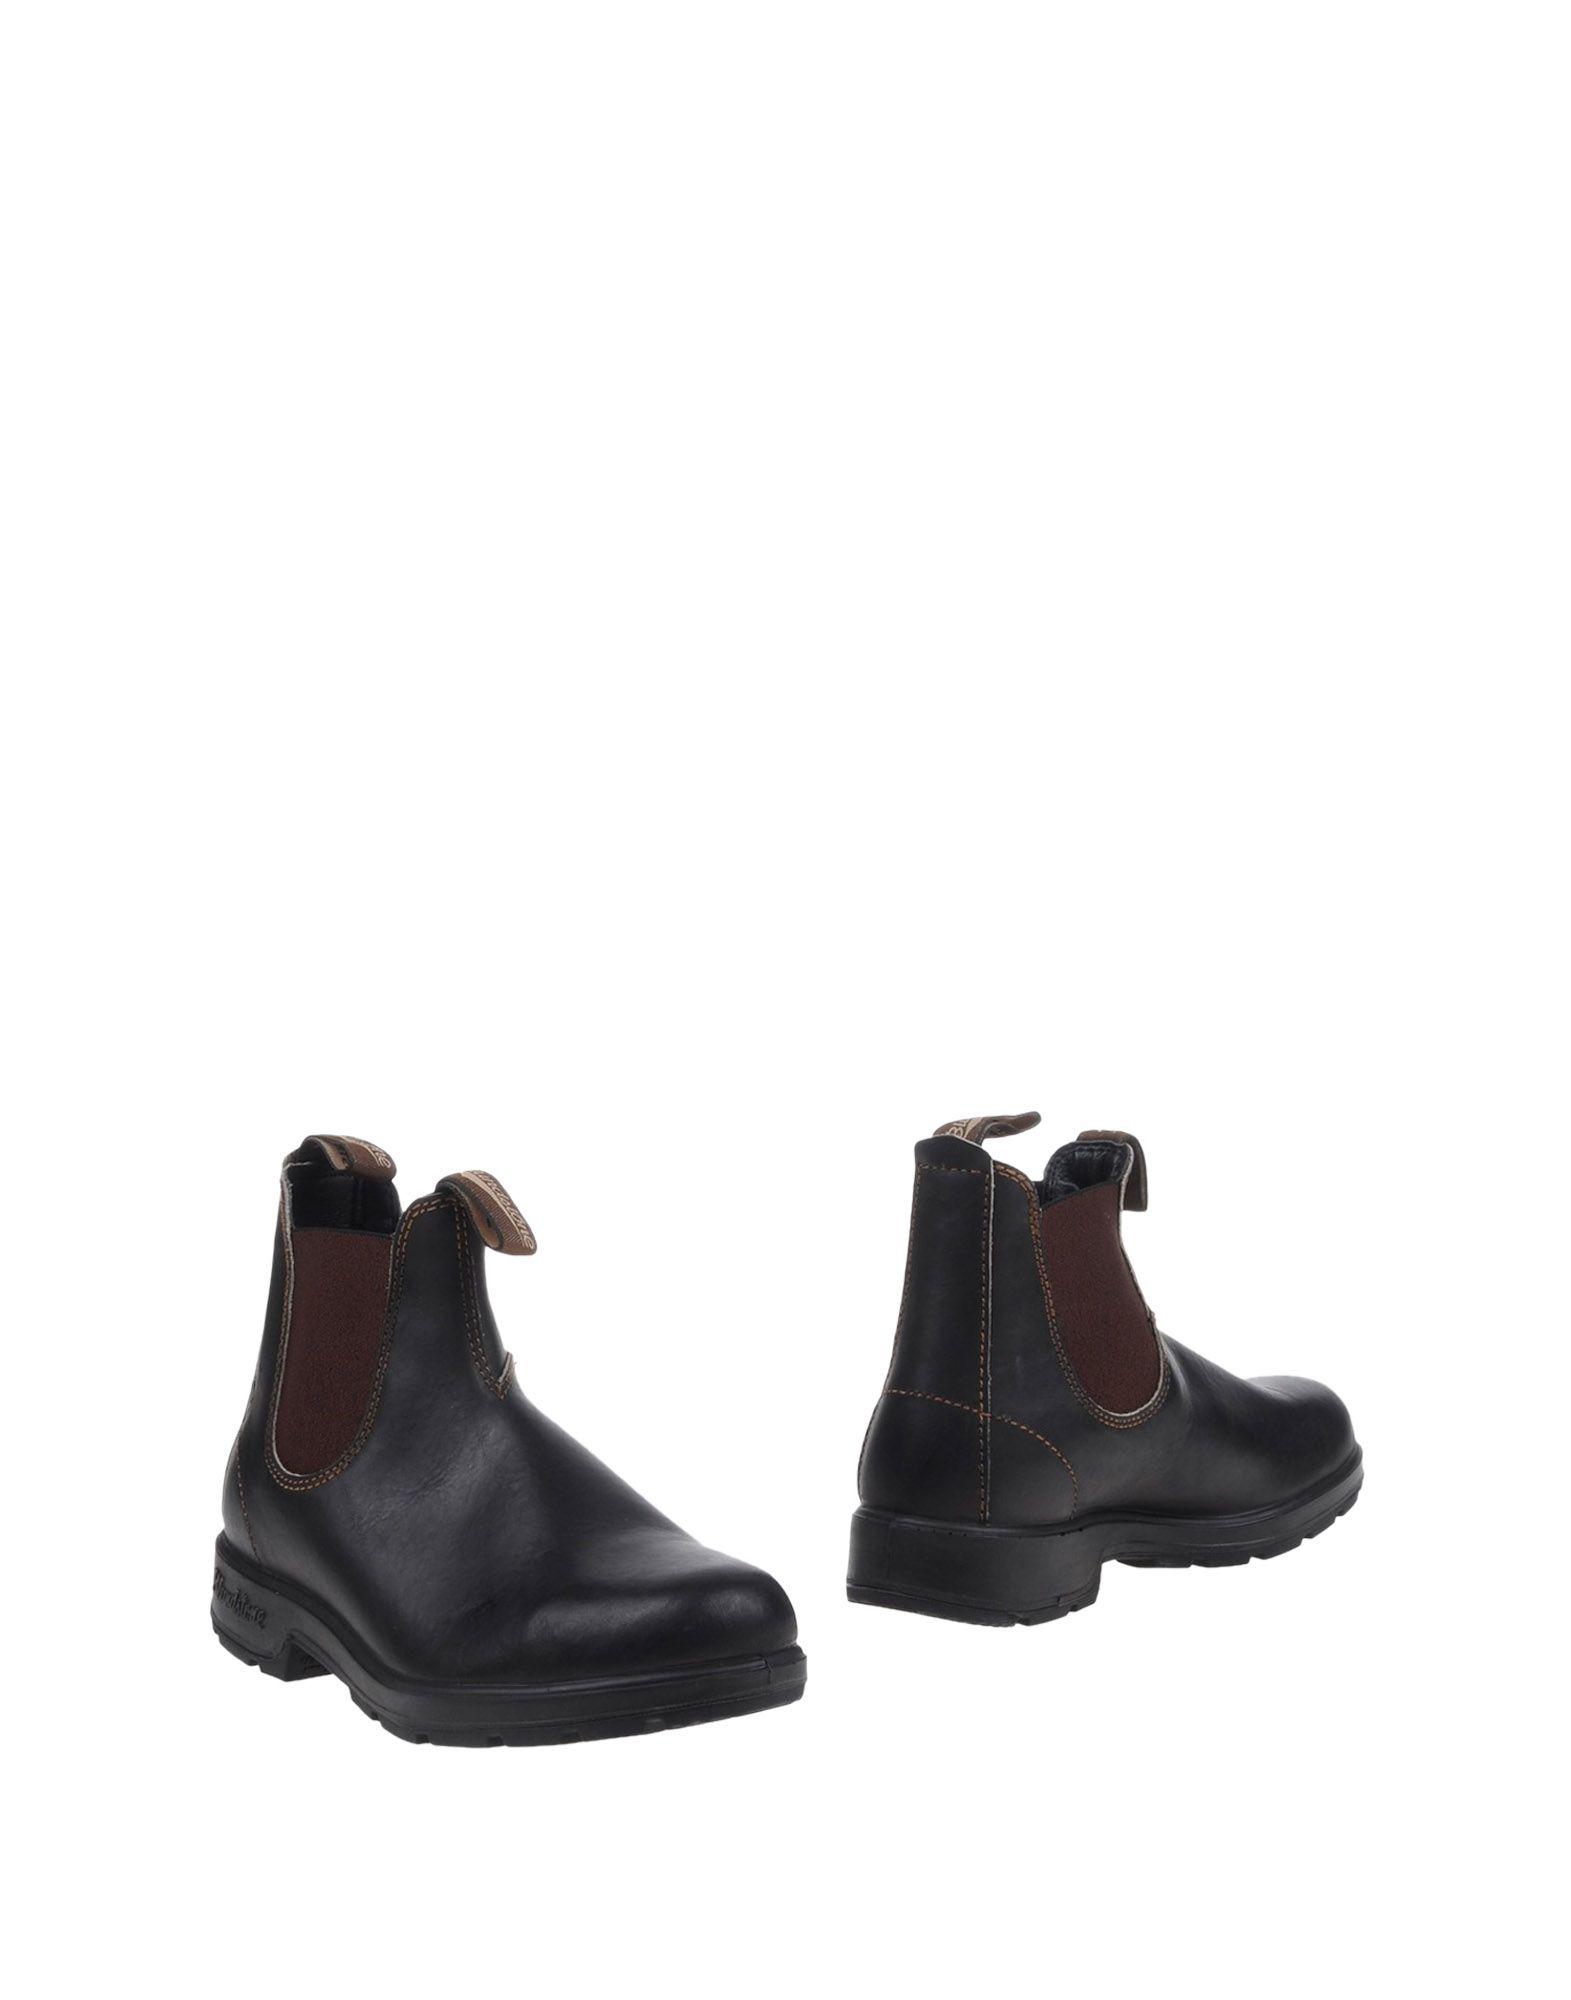 Rabatt echte Schuhe Blundstone Stiefelette Herren  11008086RG